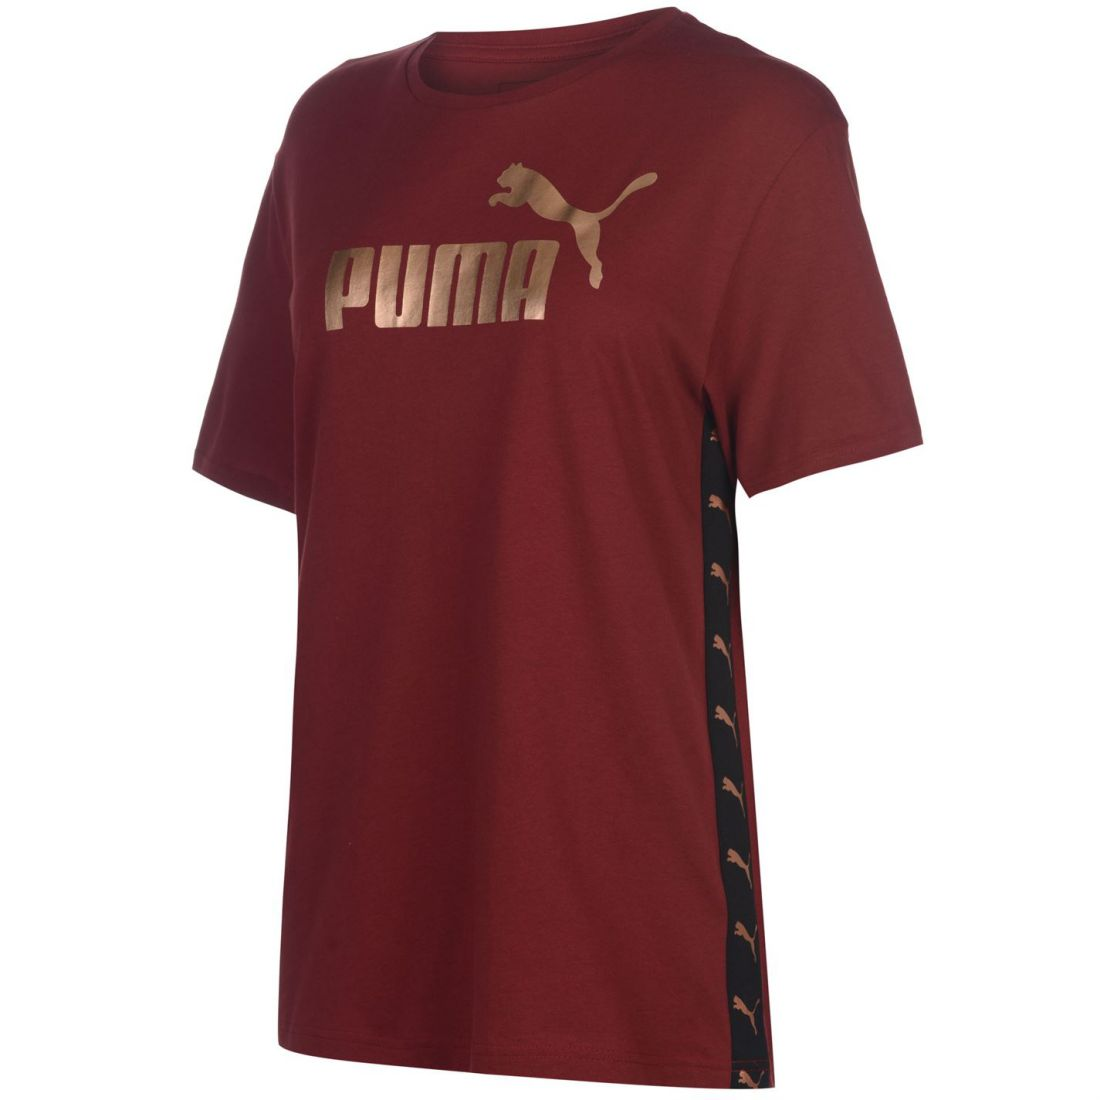 fb67480d7d95 Puma Boyfriend Logo T Shirt Ladies Crew Neck Tee Top Short Sleeve ...